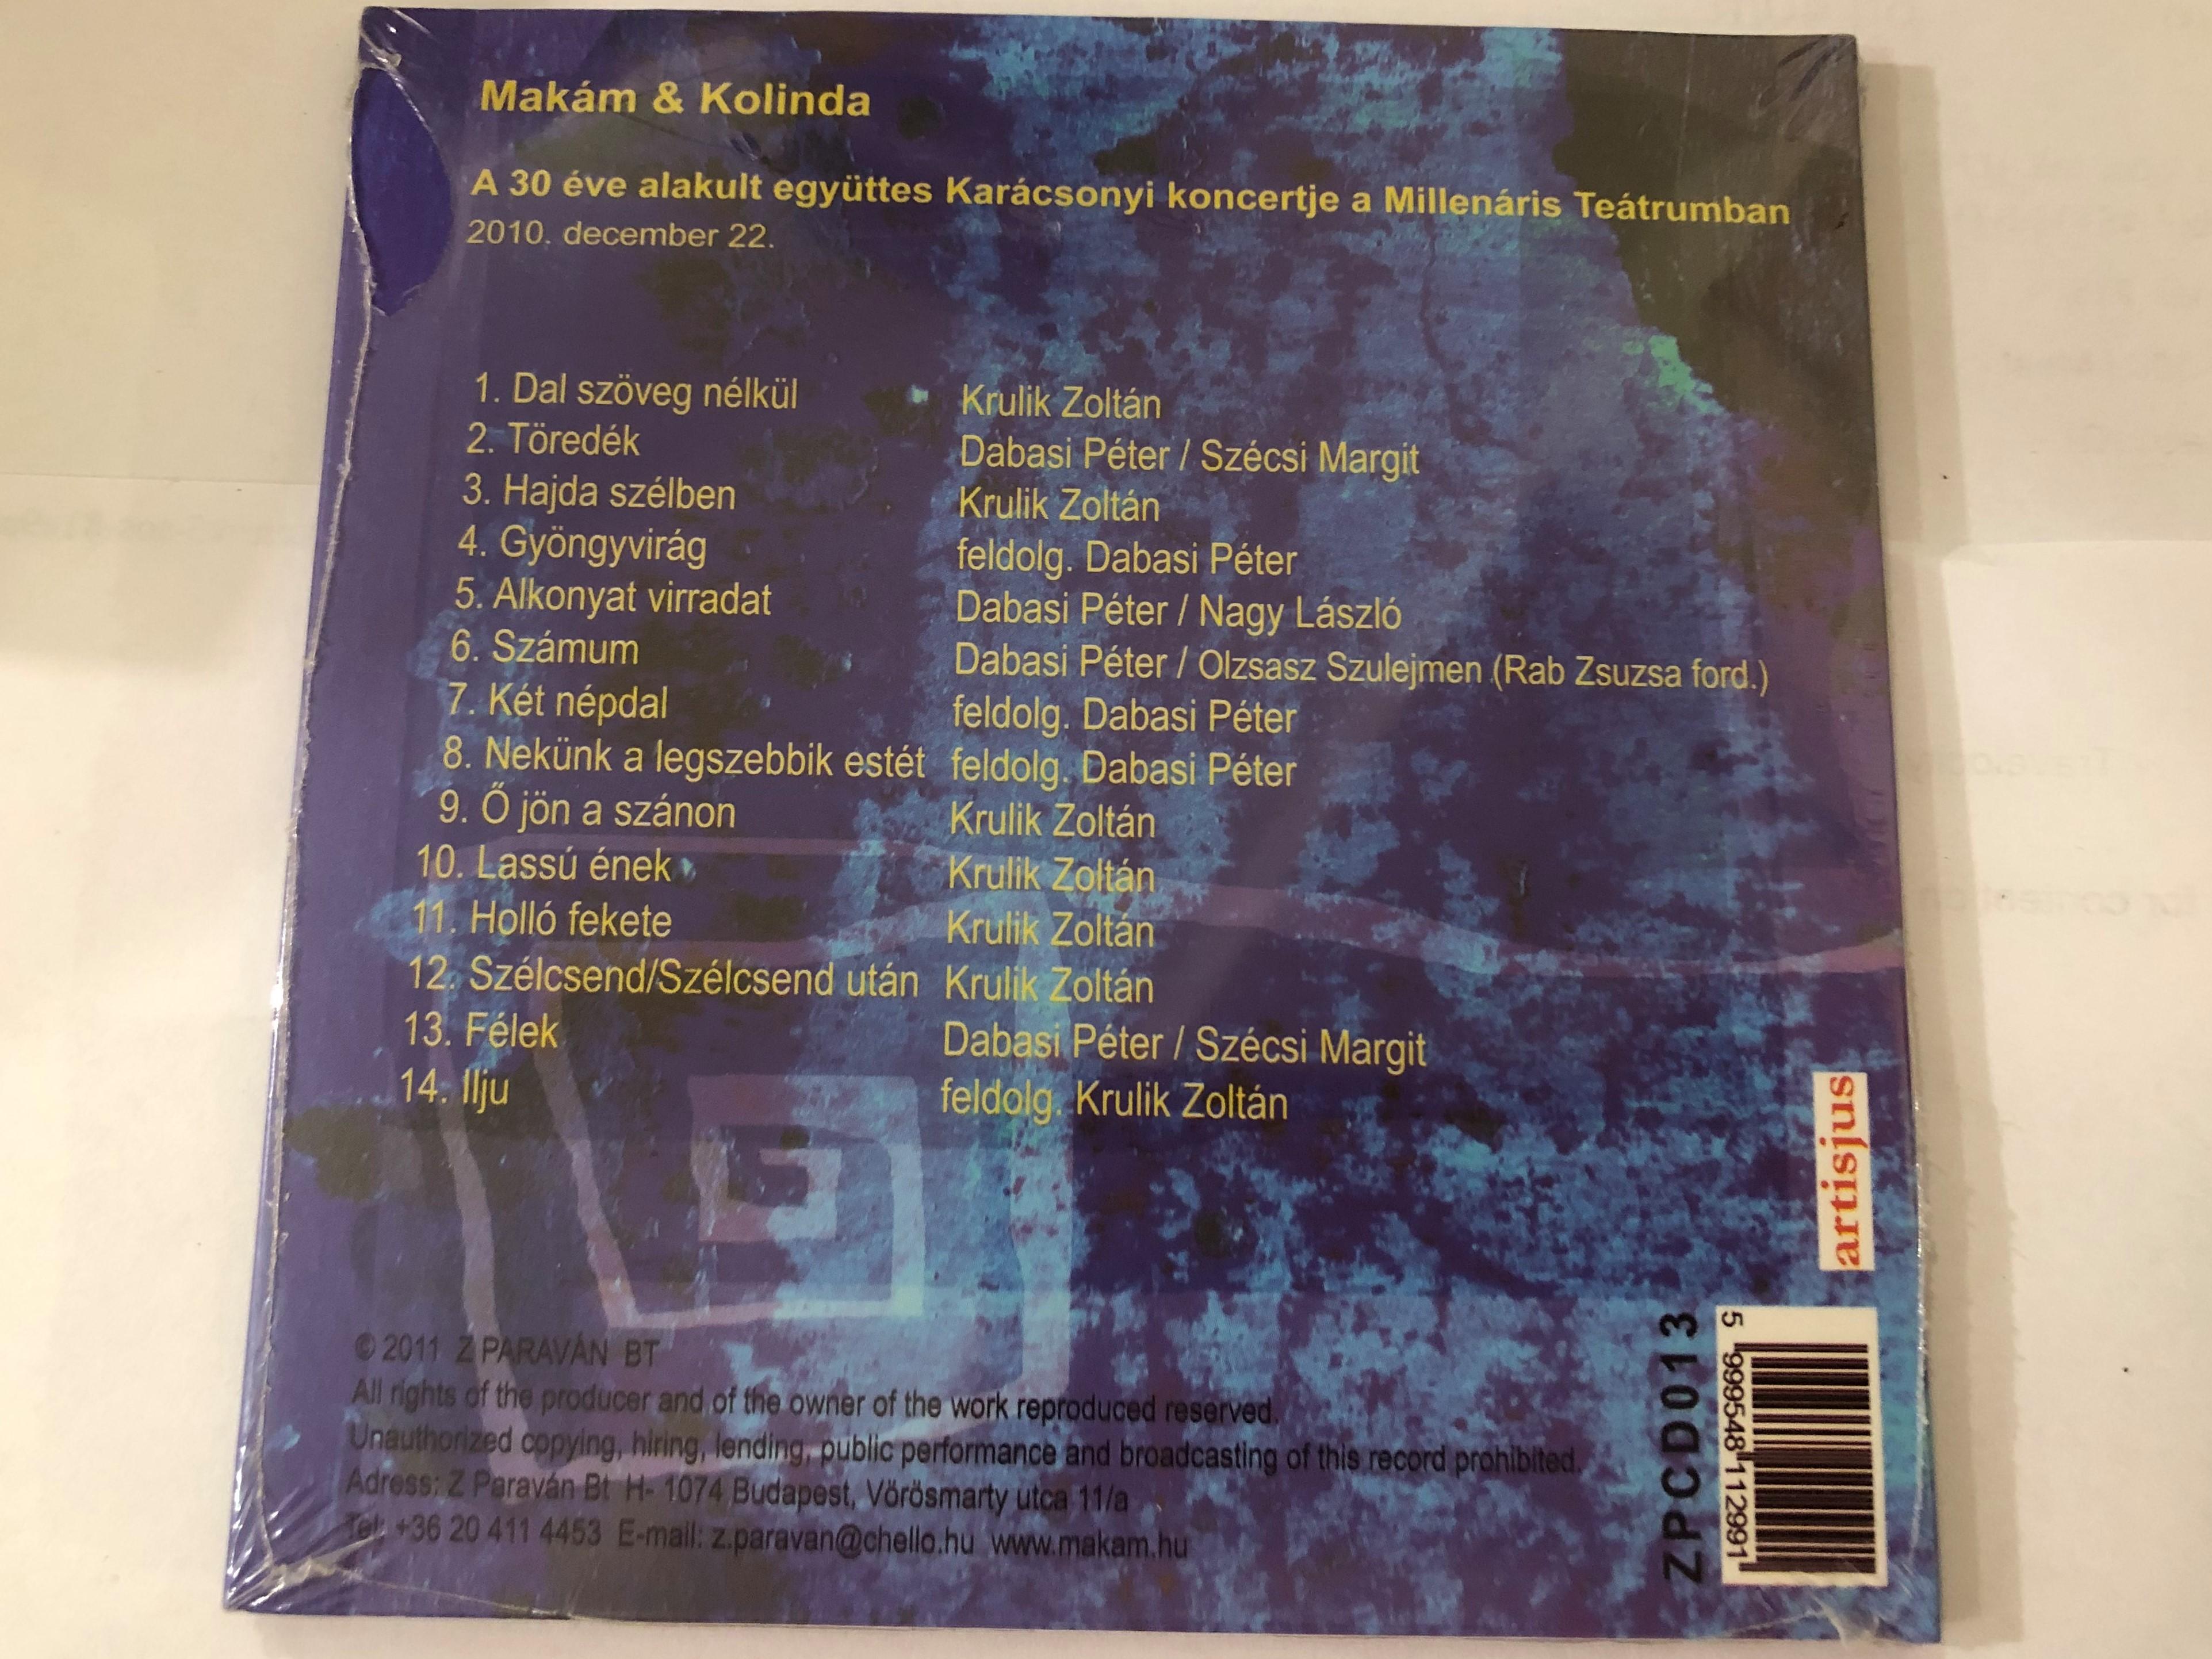 mak-m-kolinda-30.-bognar-szilvia-szirtes-edina-mokus-z-parav-n-bt-audio-cd-2011-zpcd013-2-.jpg